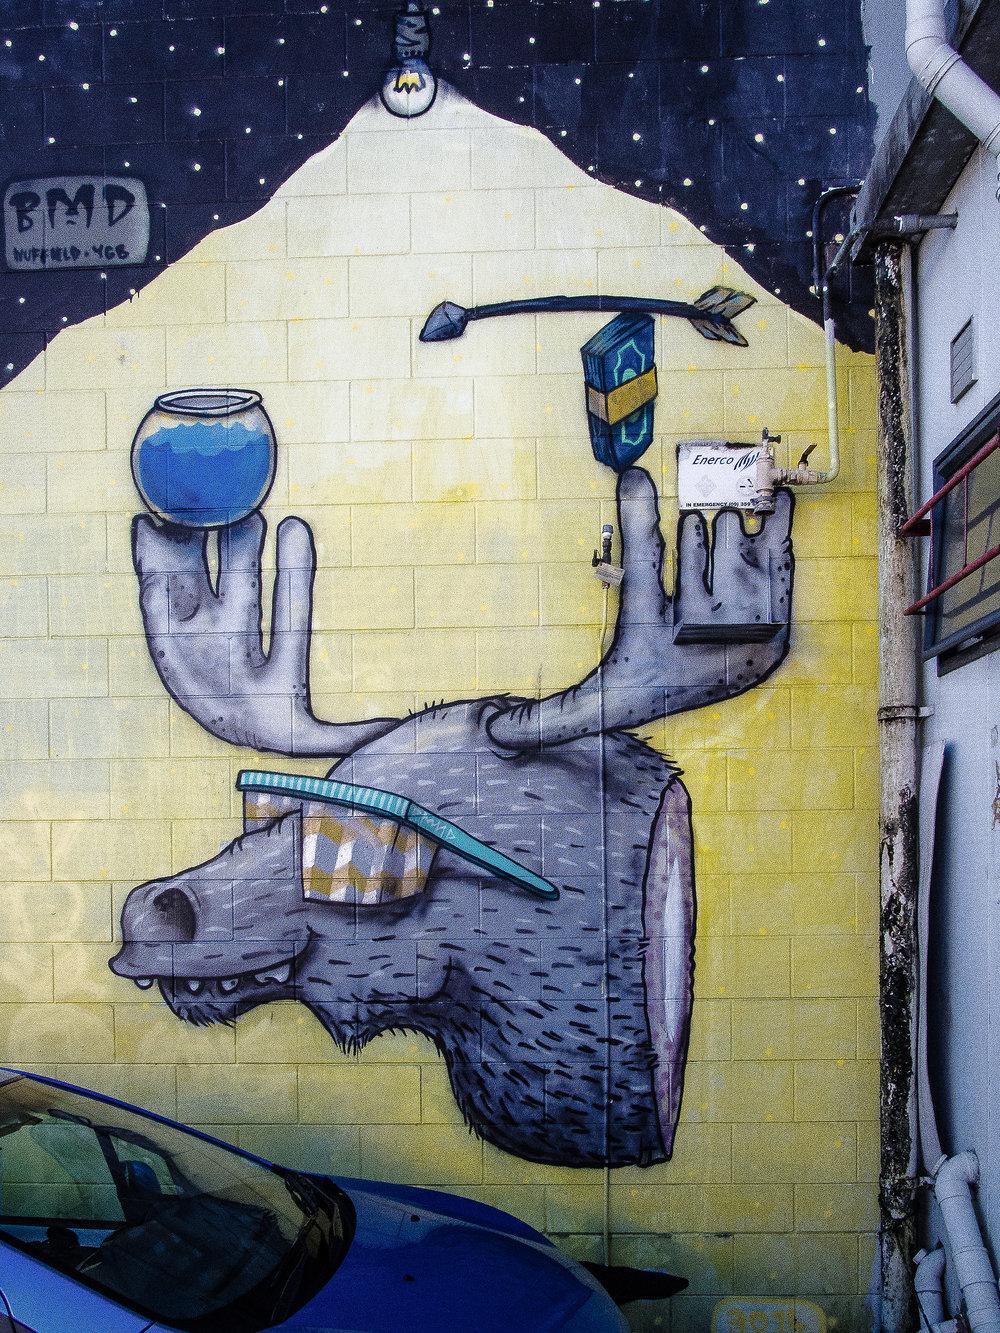 Nuffield Lane, Newmarket, Auckland - June 2017-5.jpg